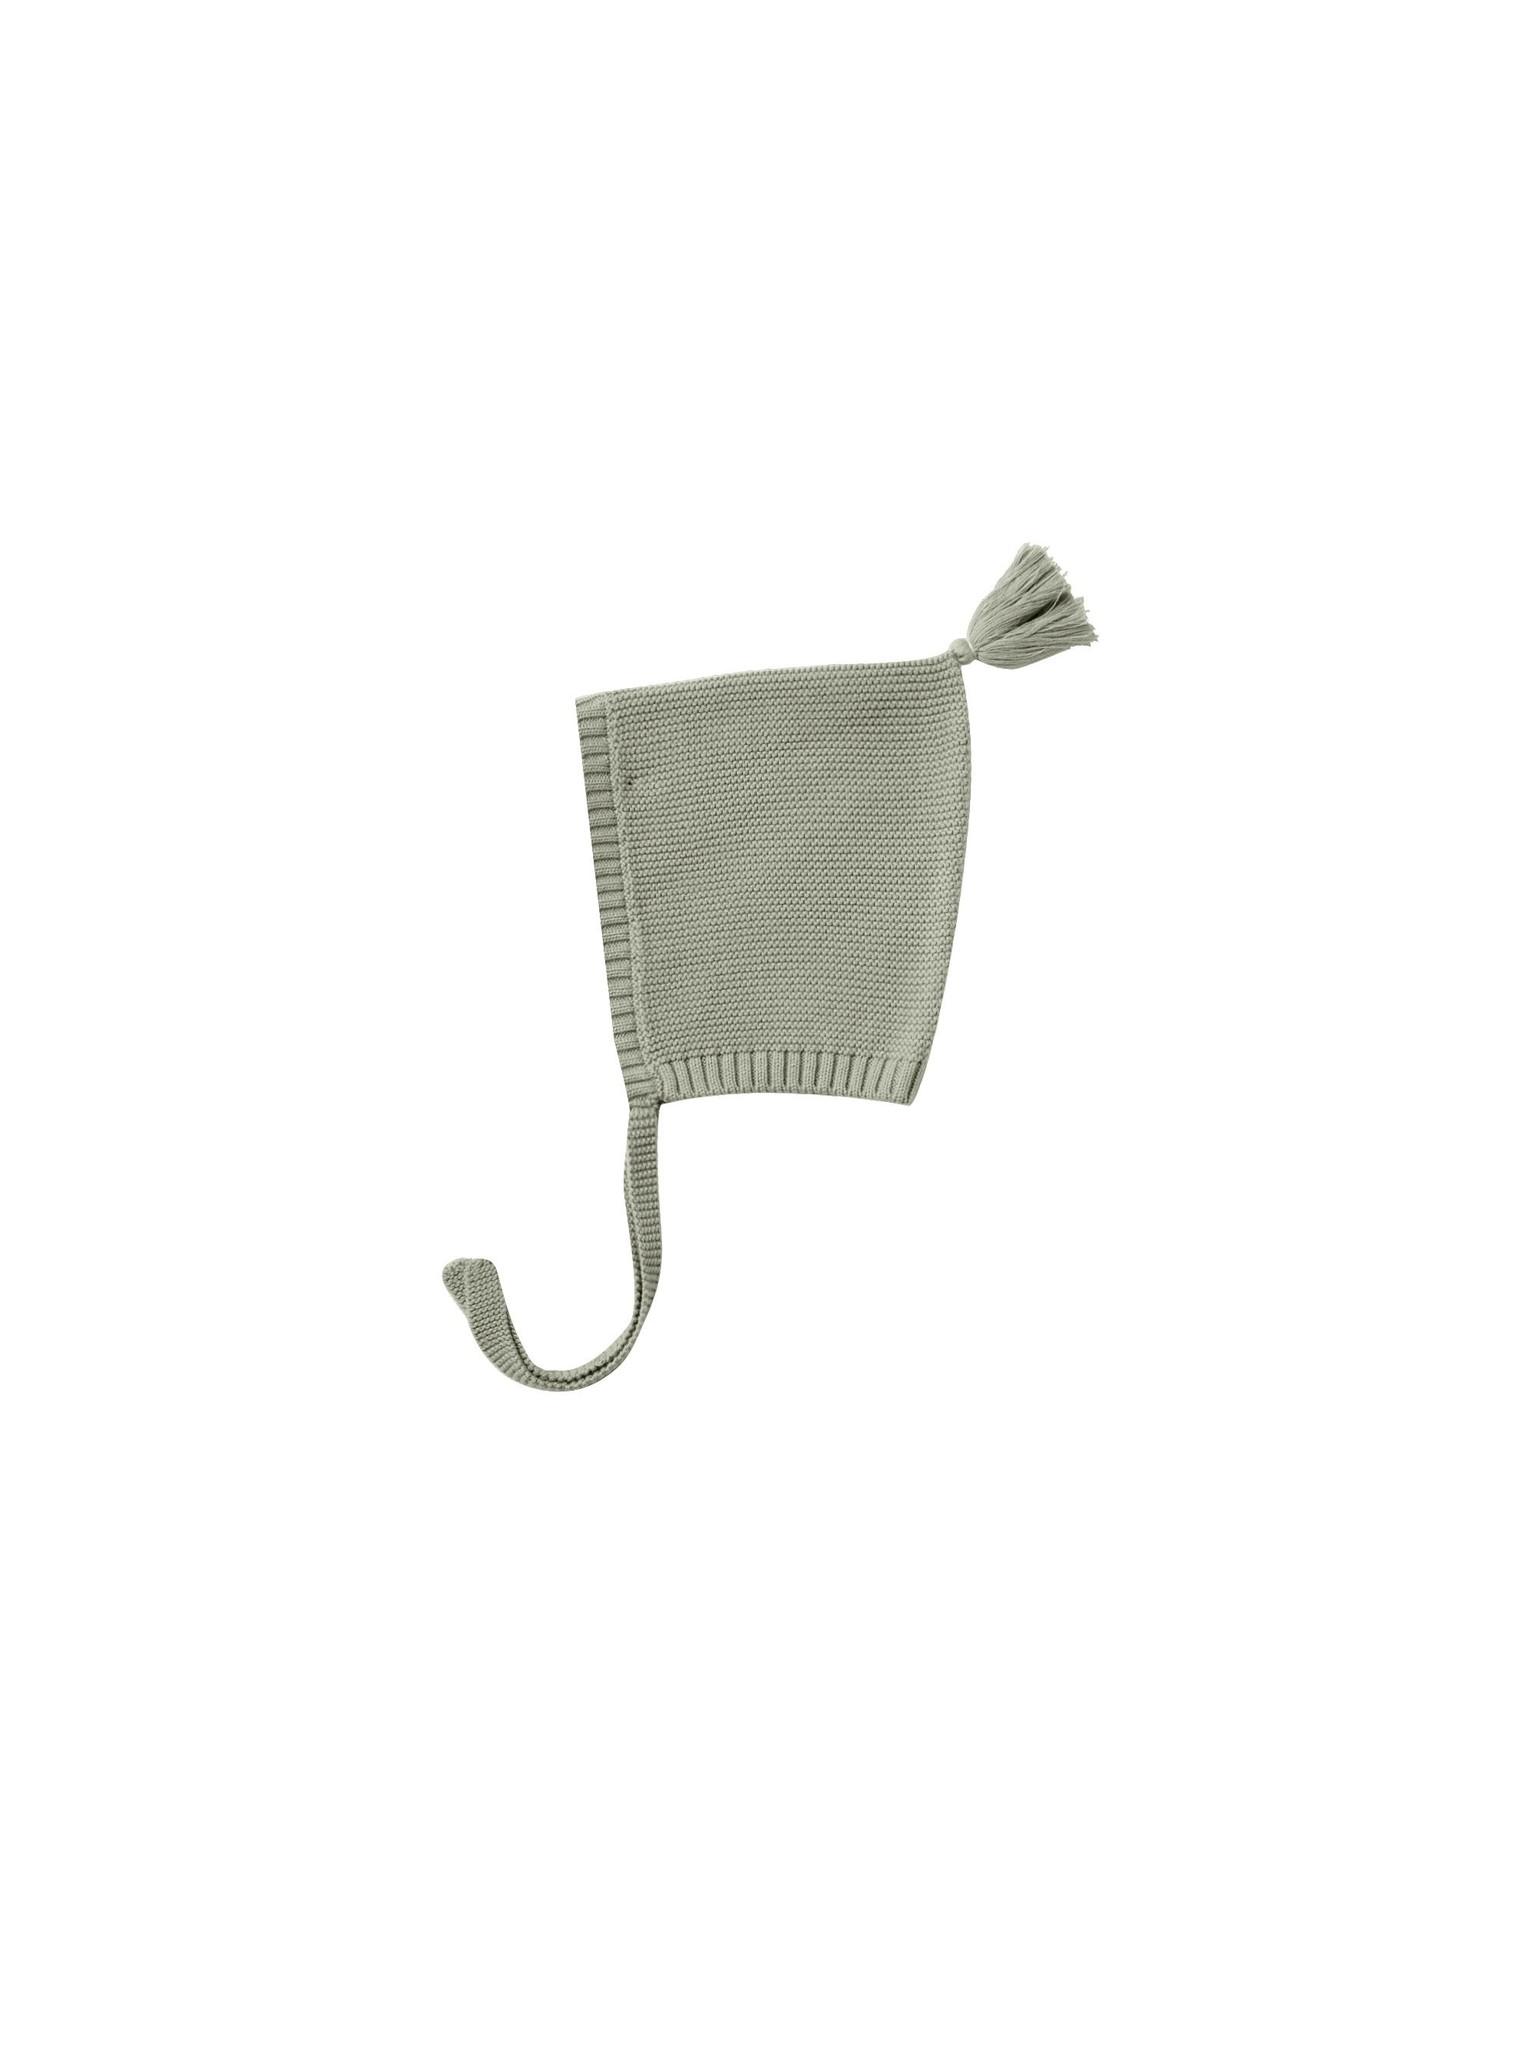 Quincy Mae Knit Pixie Bonnet - organic sweater knit (Sage)